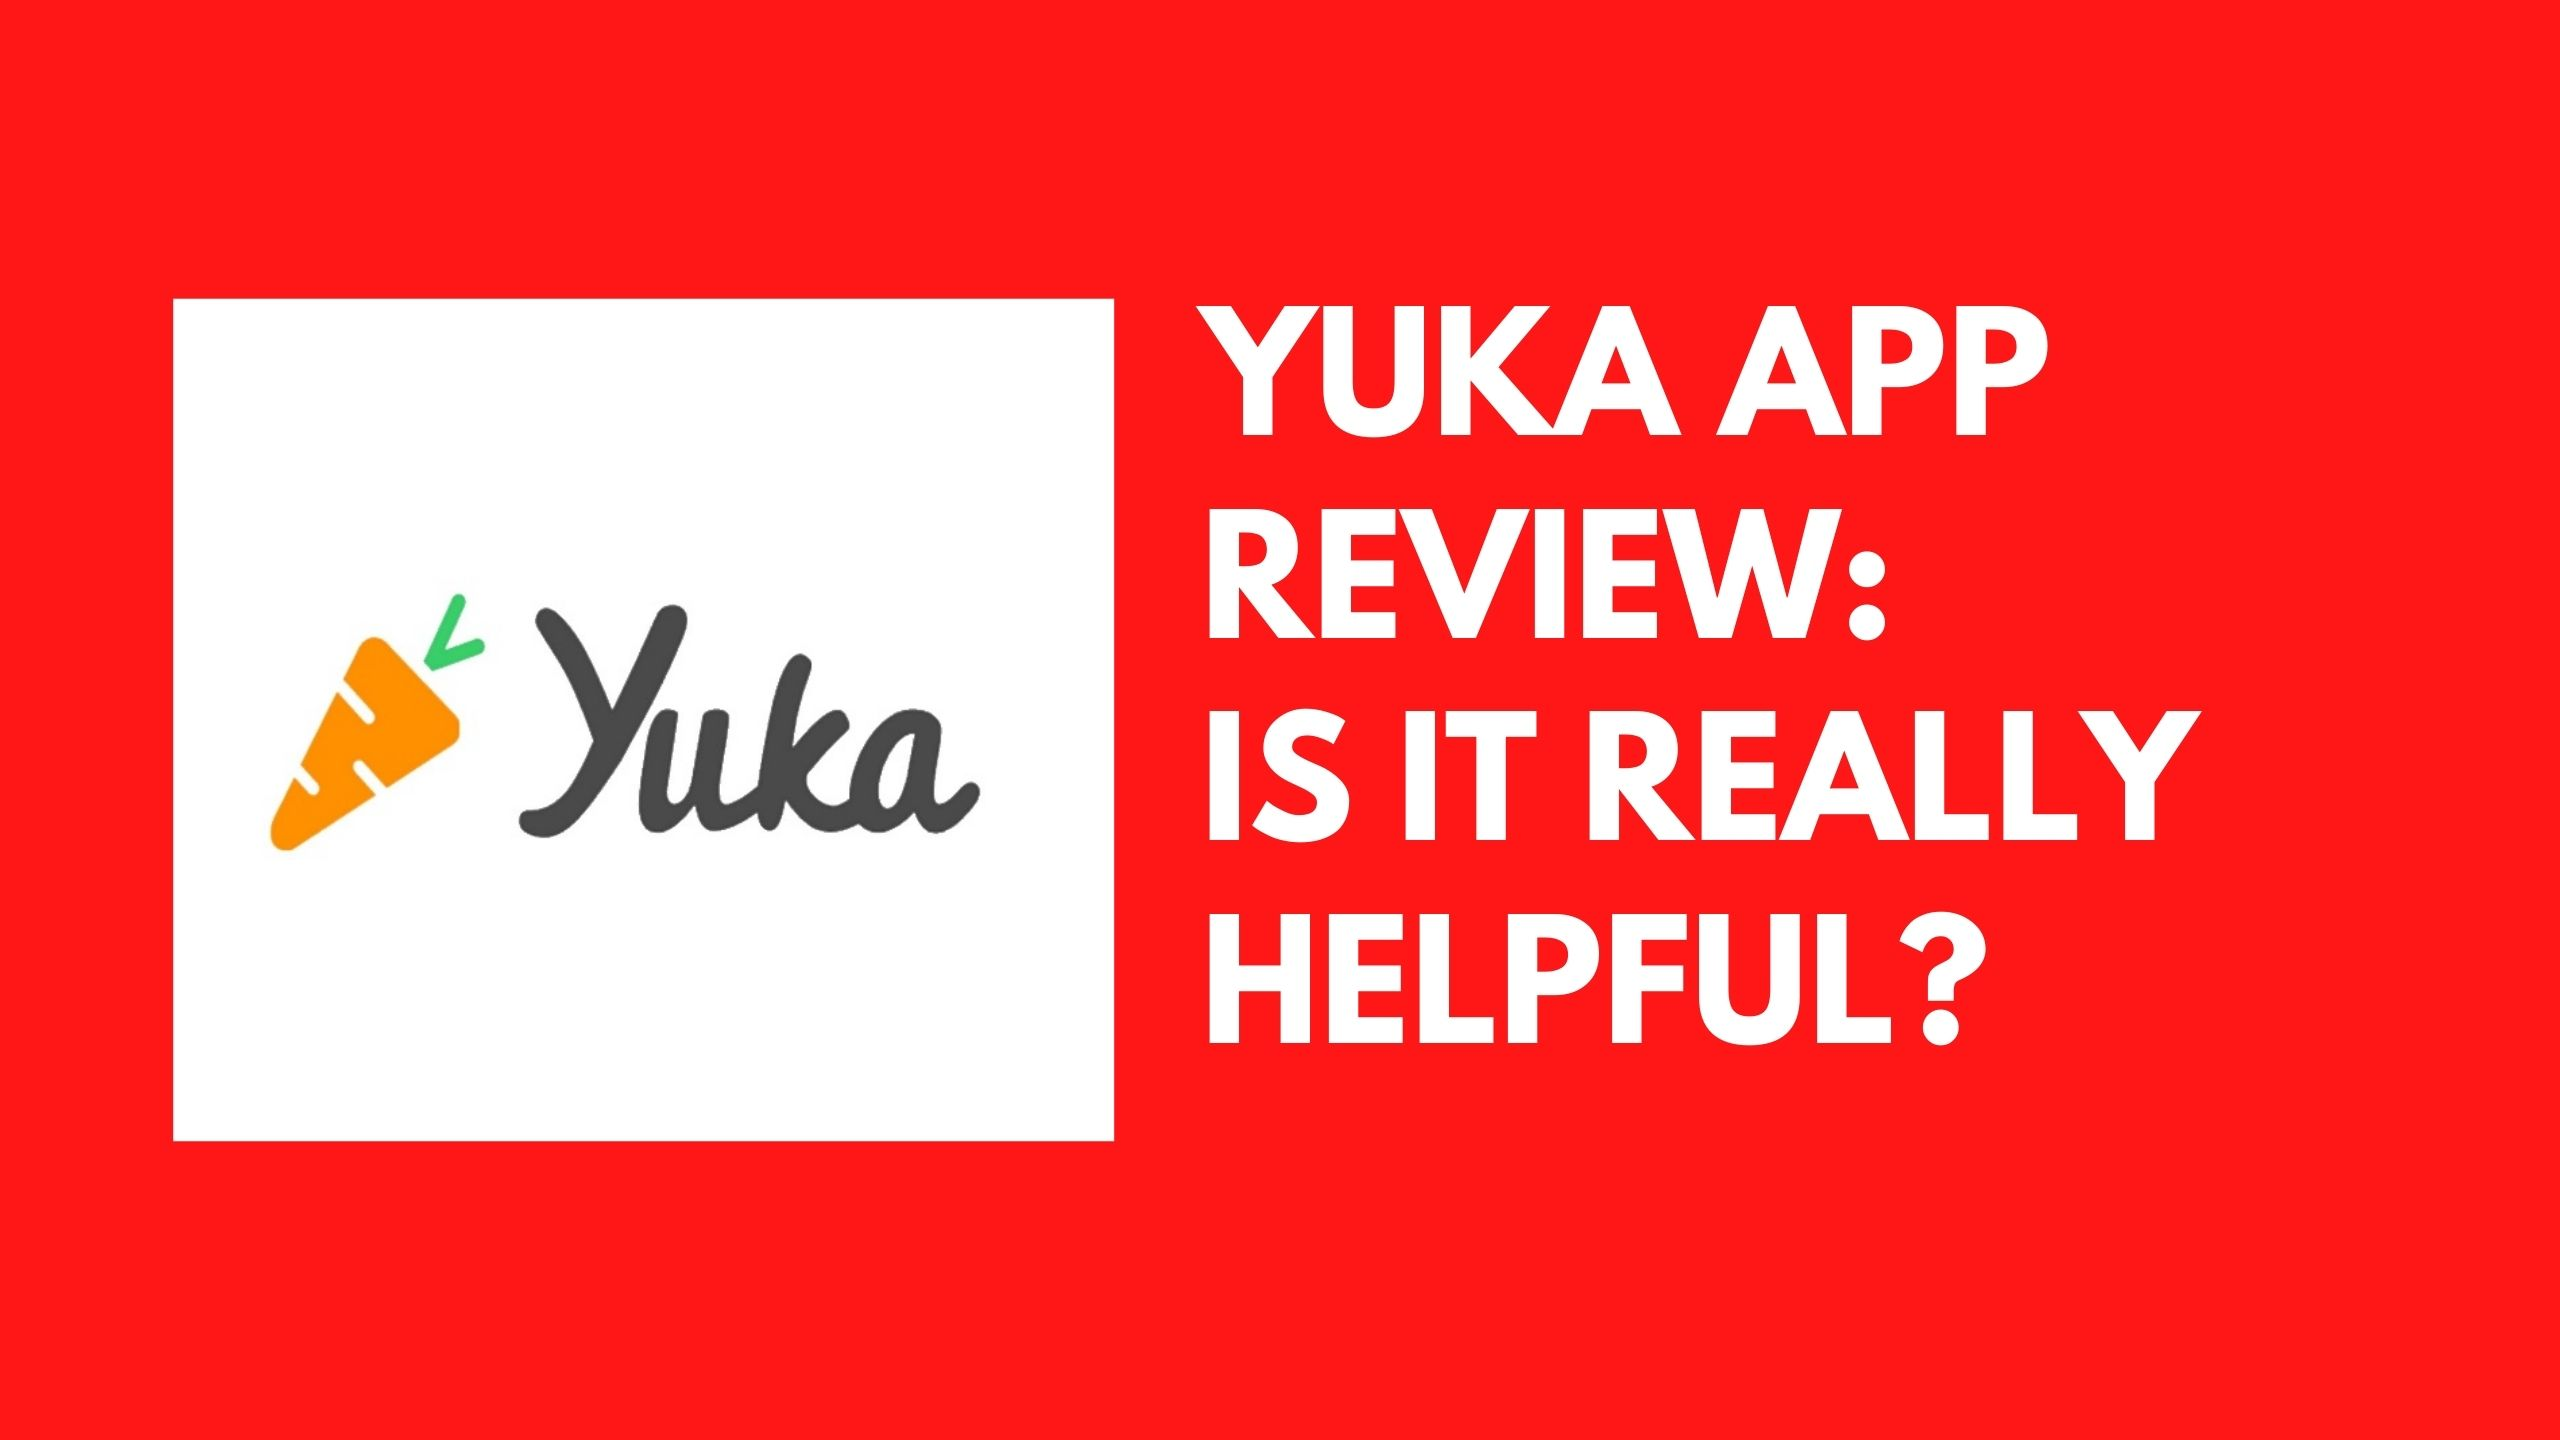 yuka Box App Review